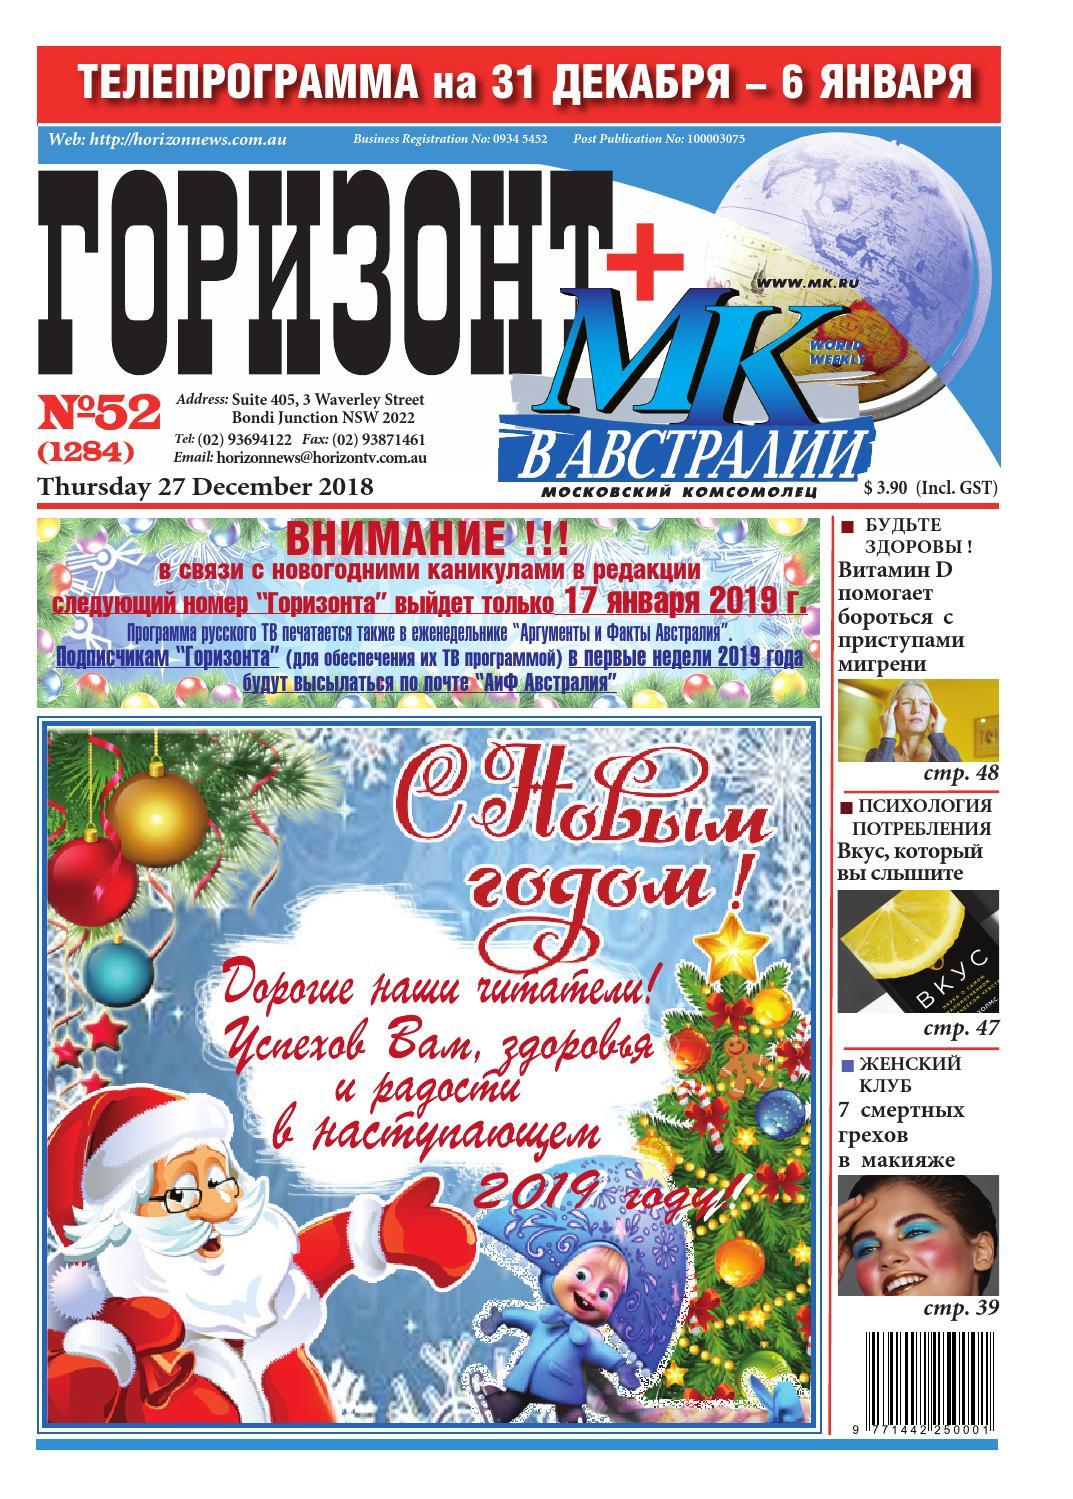 acd252d5c2c Горизонт № 52 by Horizon Media Group - issuu